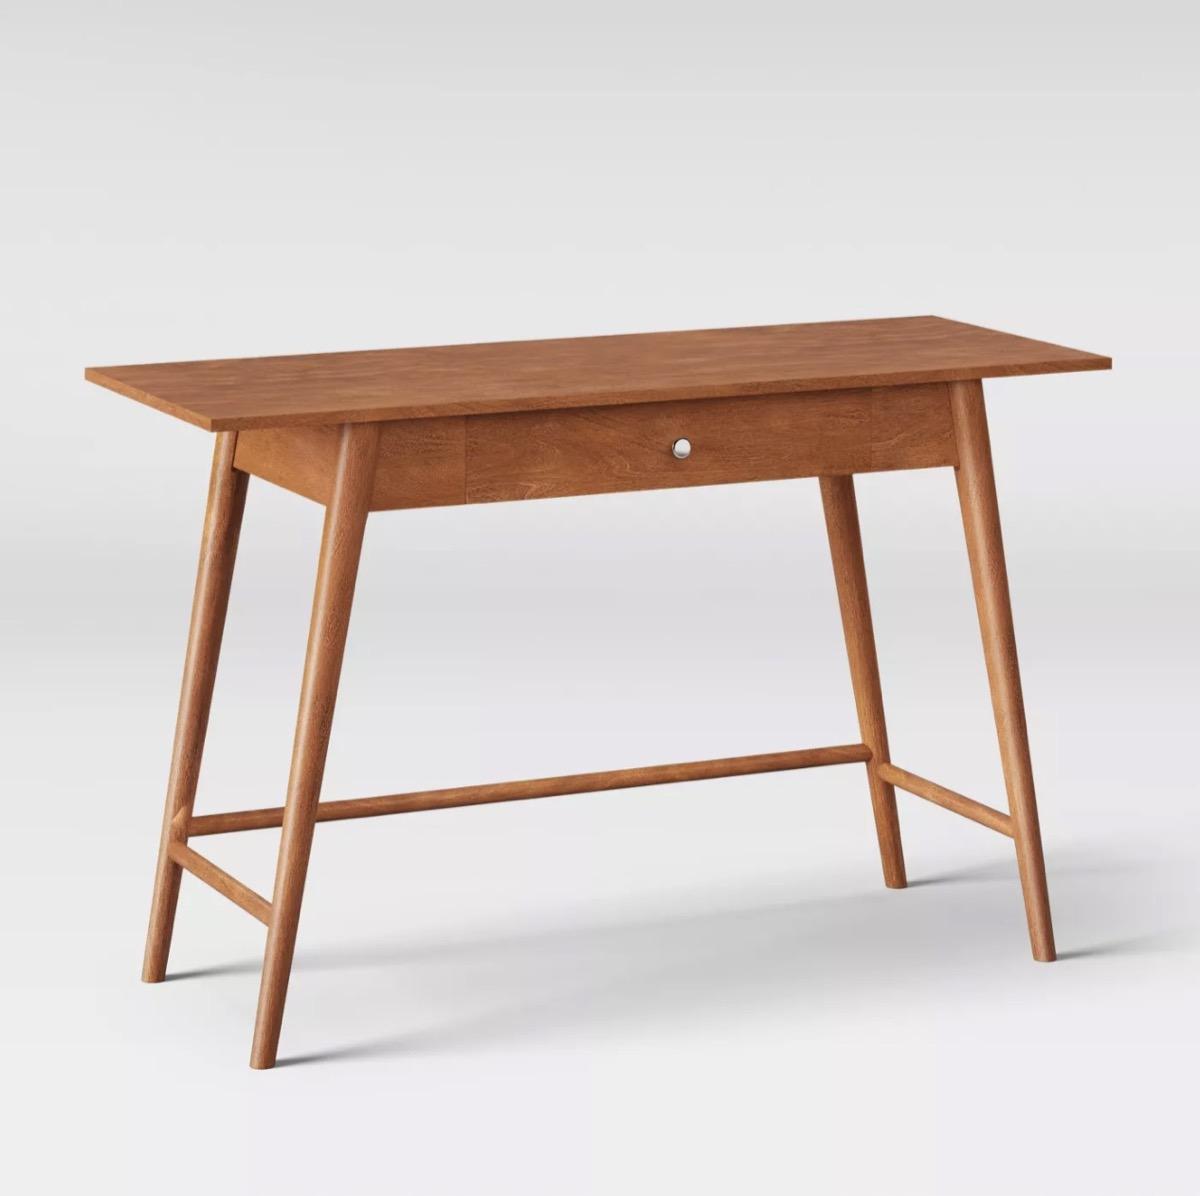 wooden desk, Target home decor items